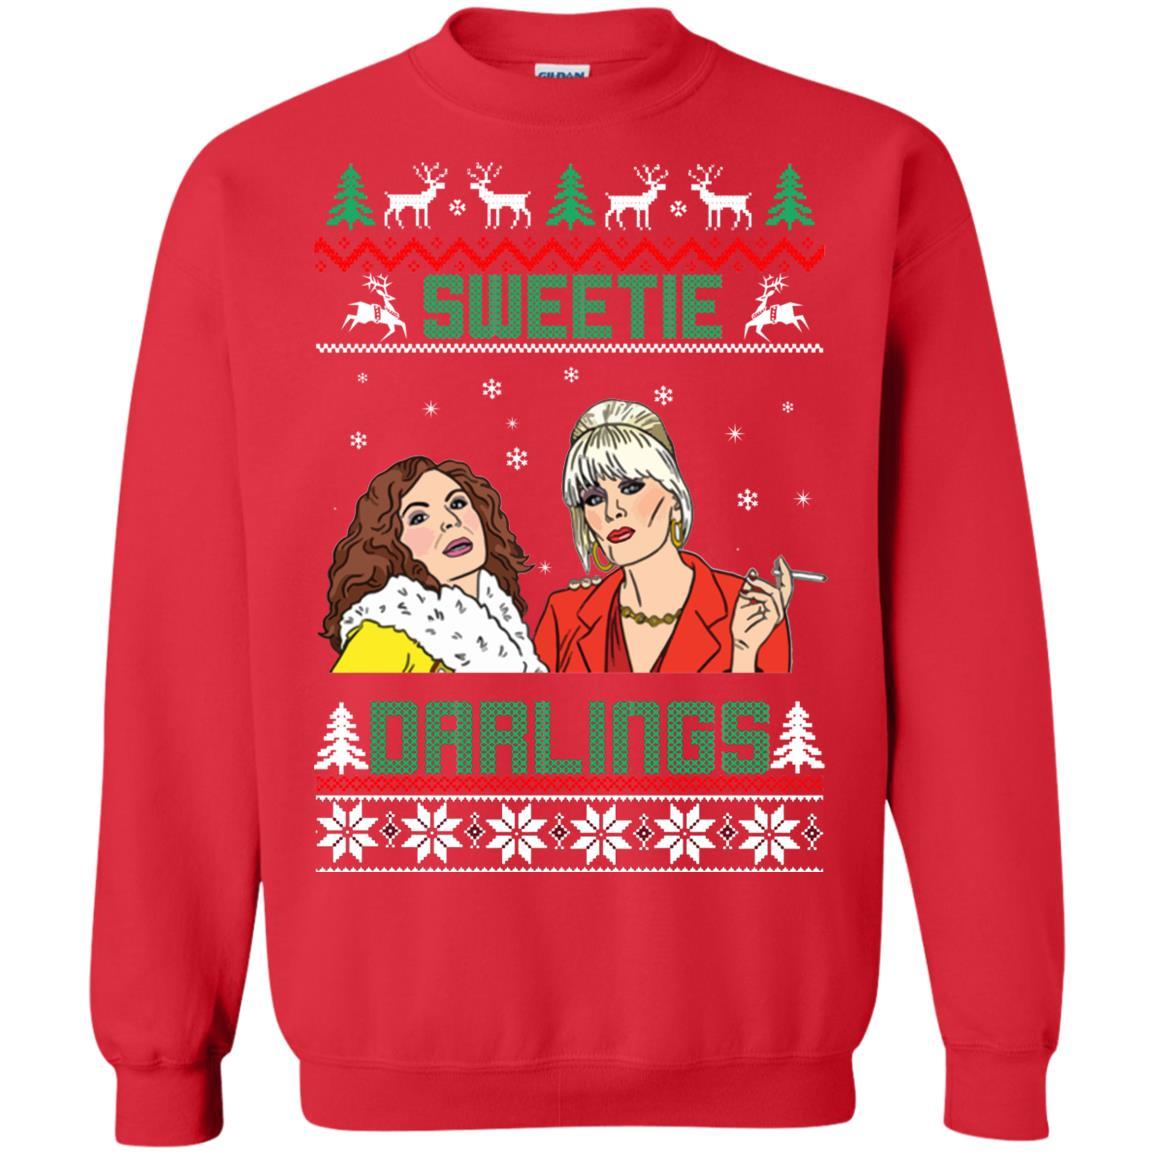 Patsy and edina Sweetie Darling Christmas sweatshirt